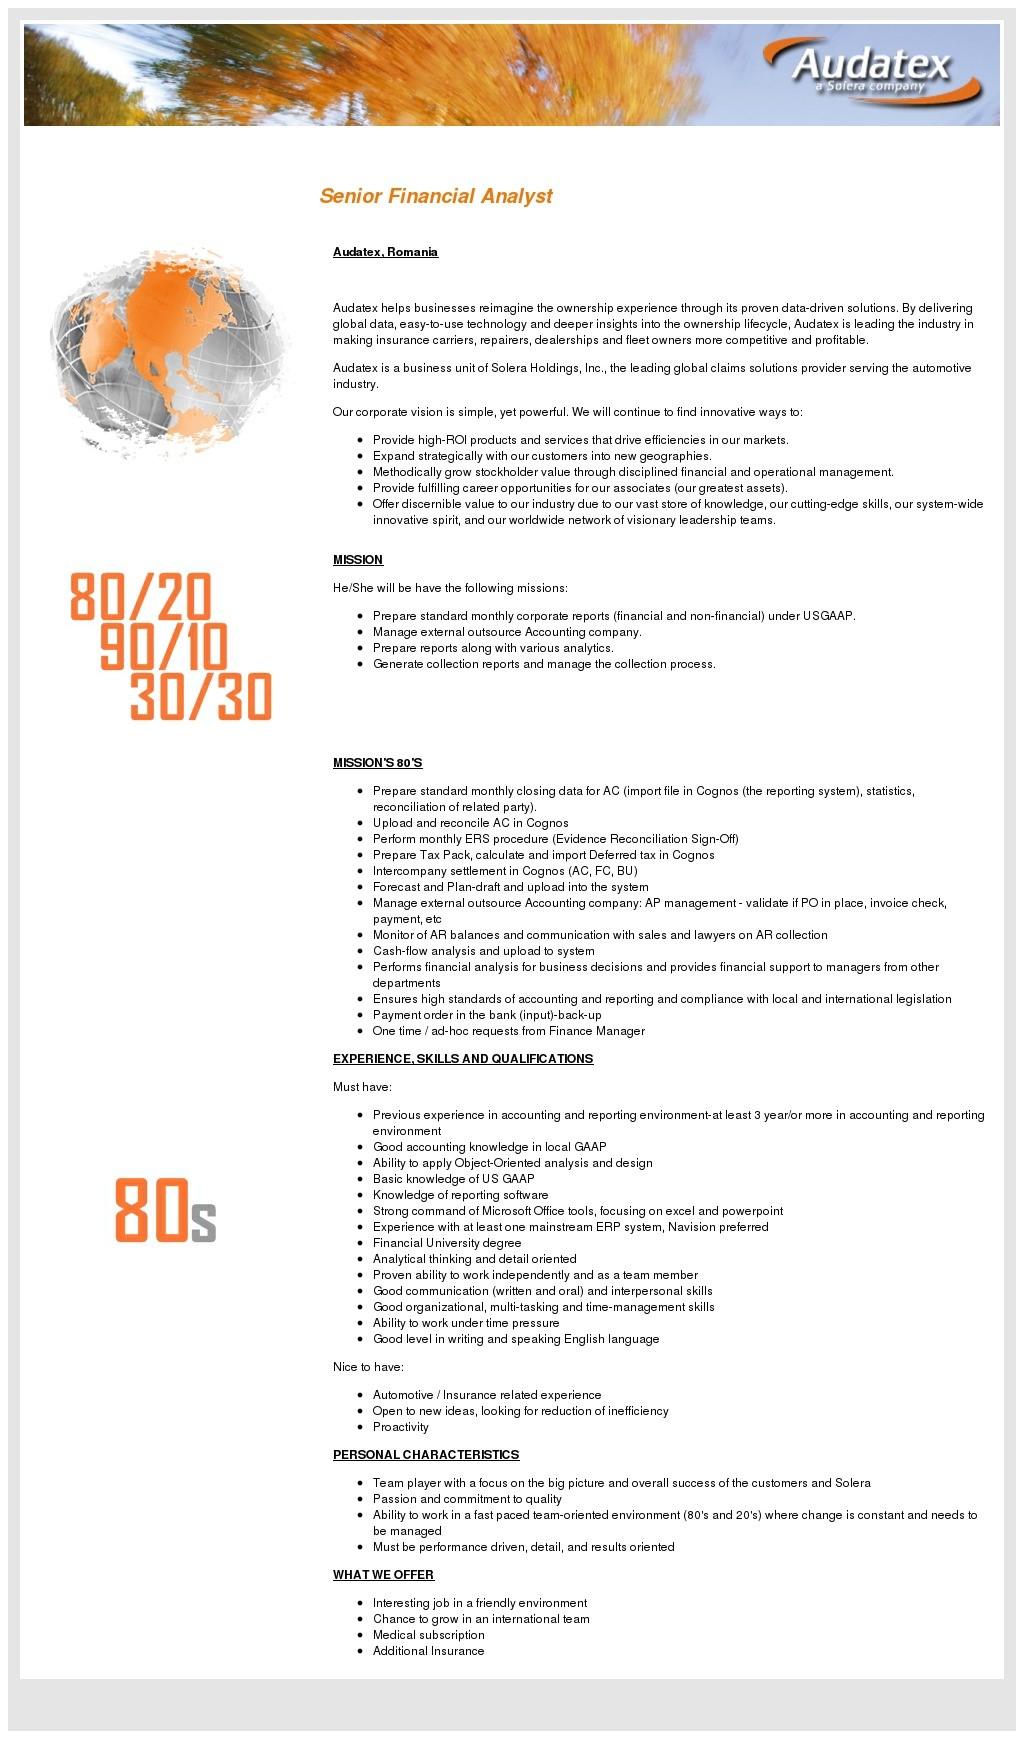 Sr-Financial-Analyst-Romania_v2_L